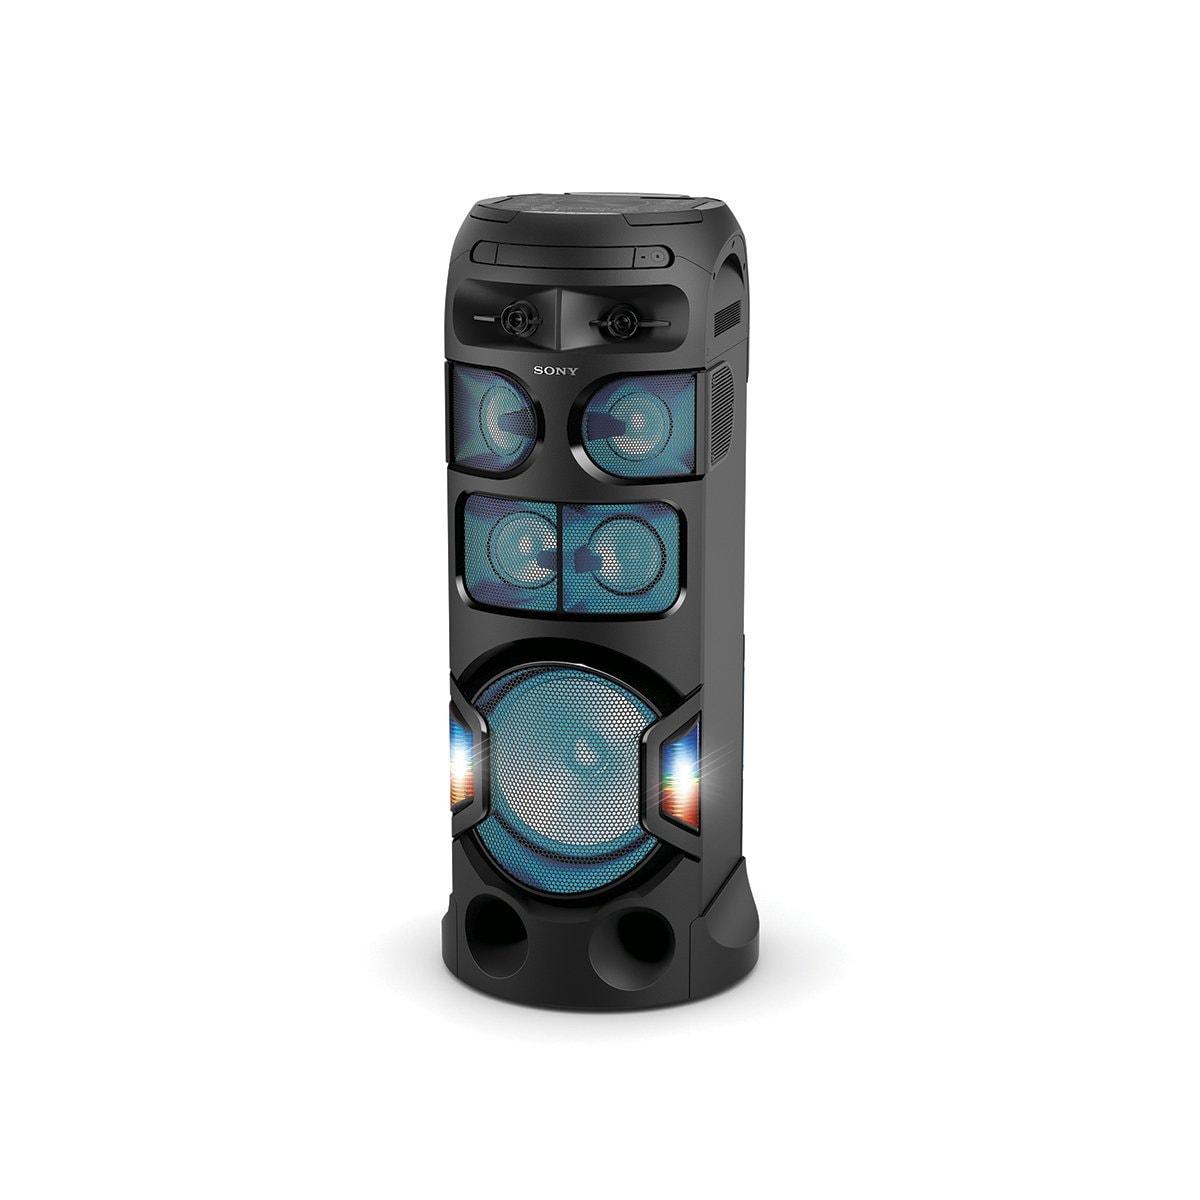 Mini Sistema de Audio Mhc-V81 Sony